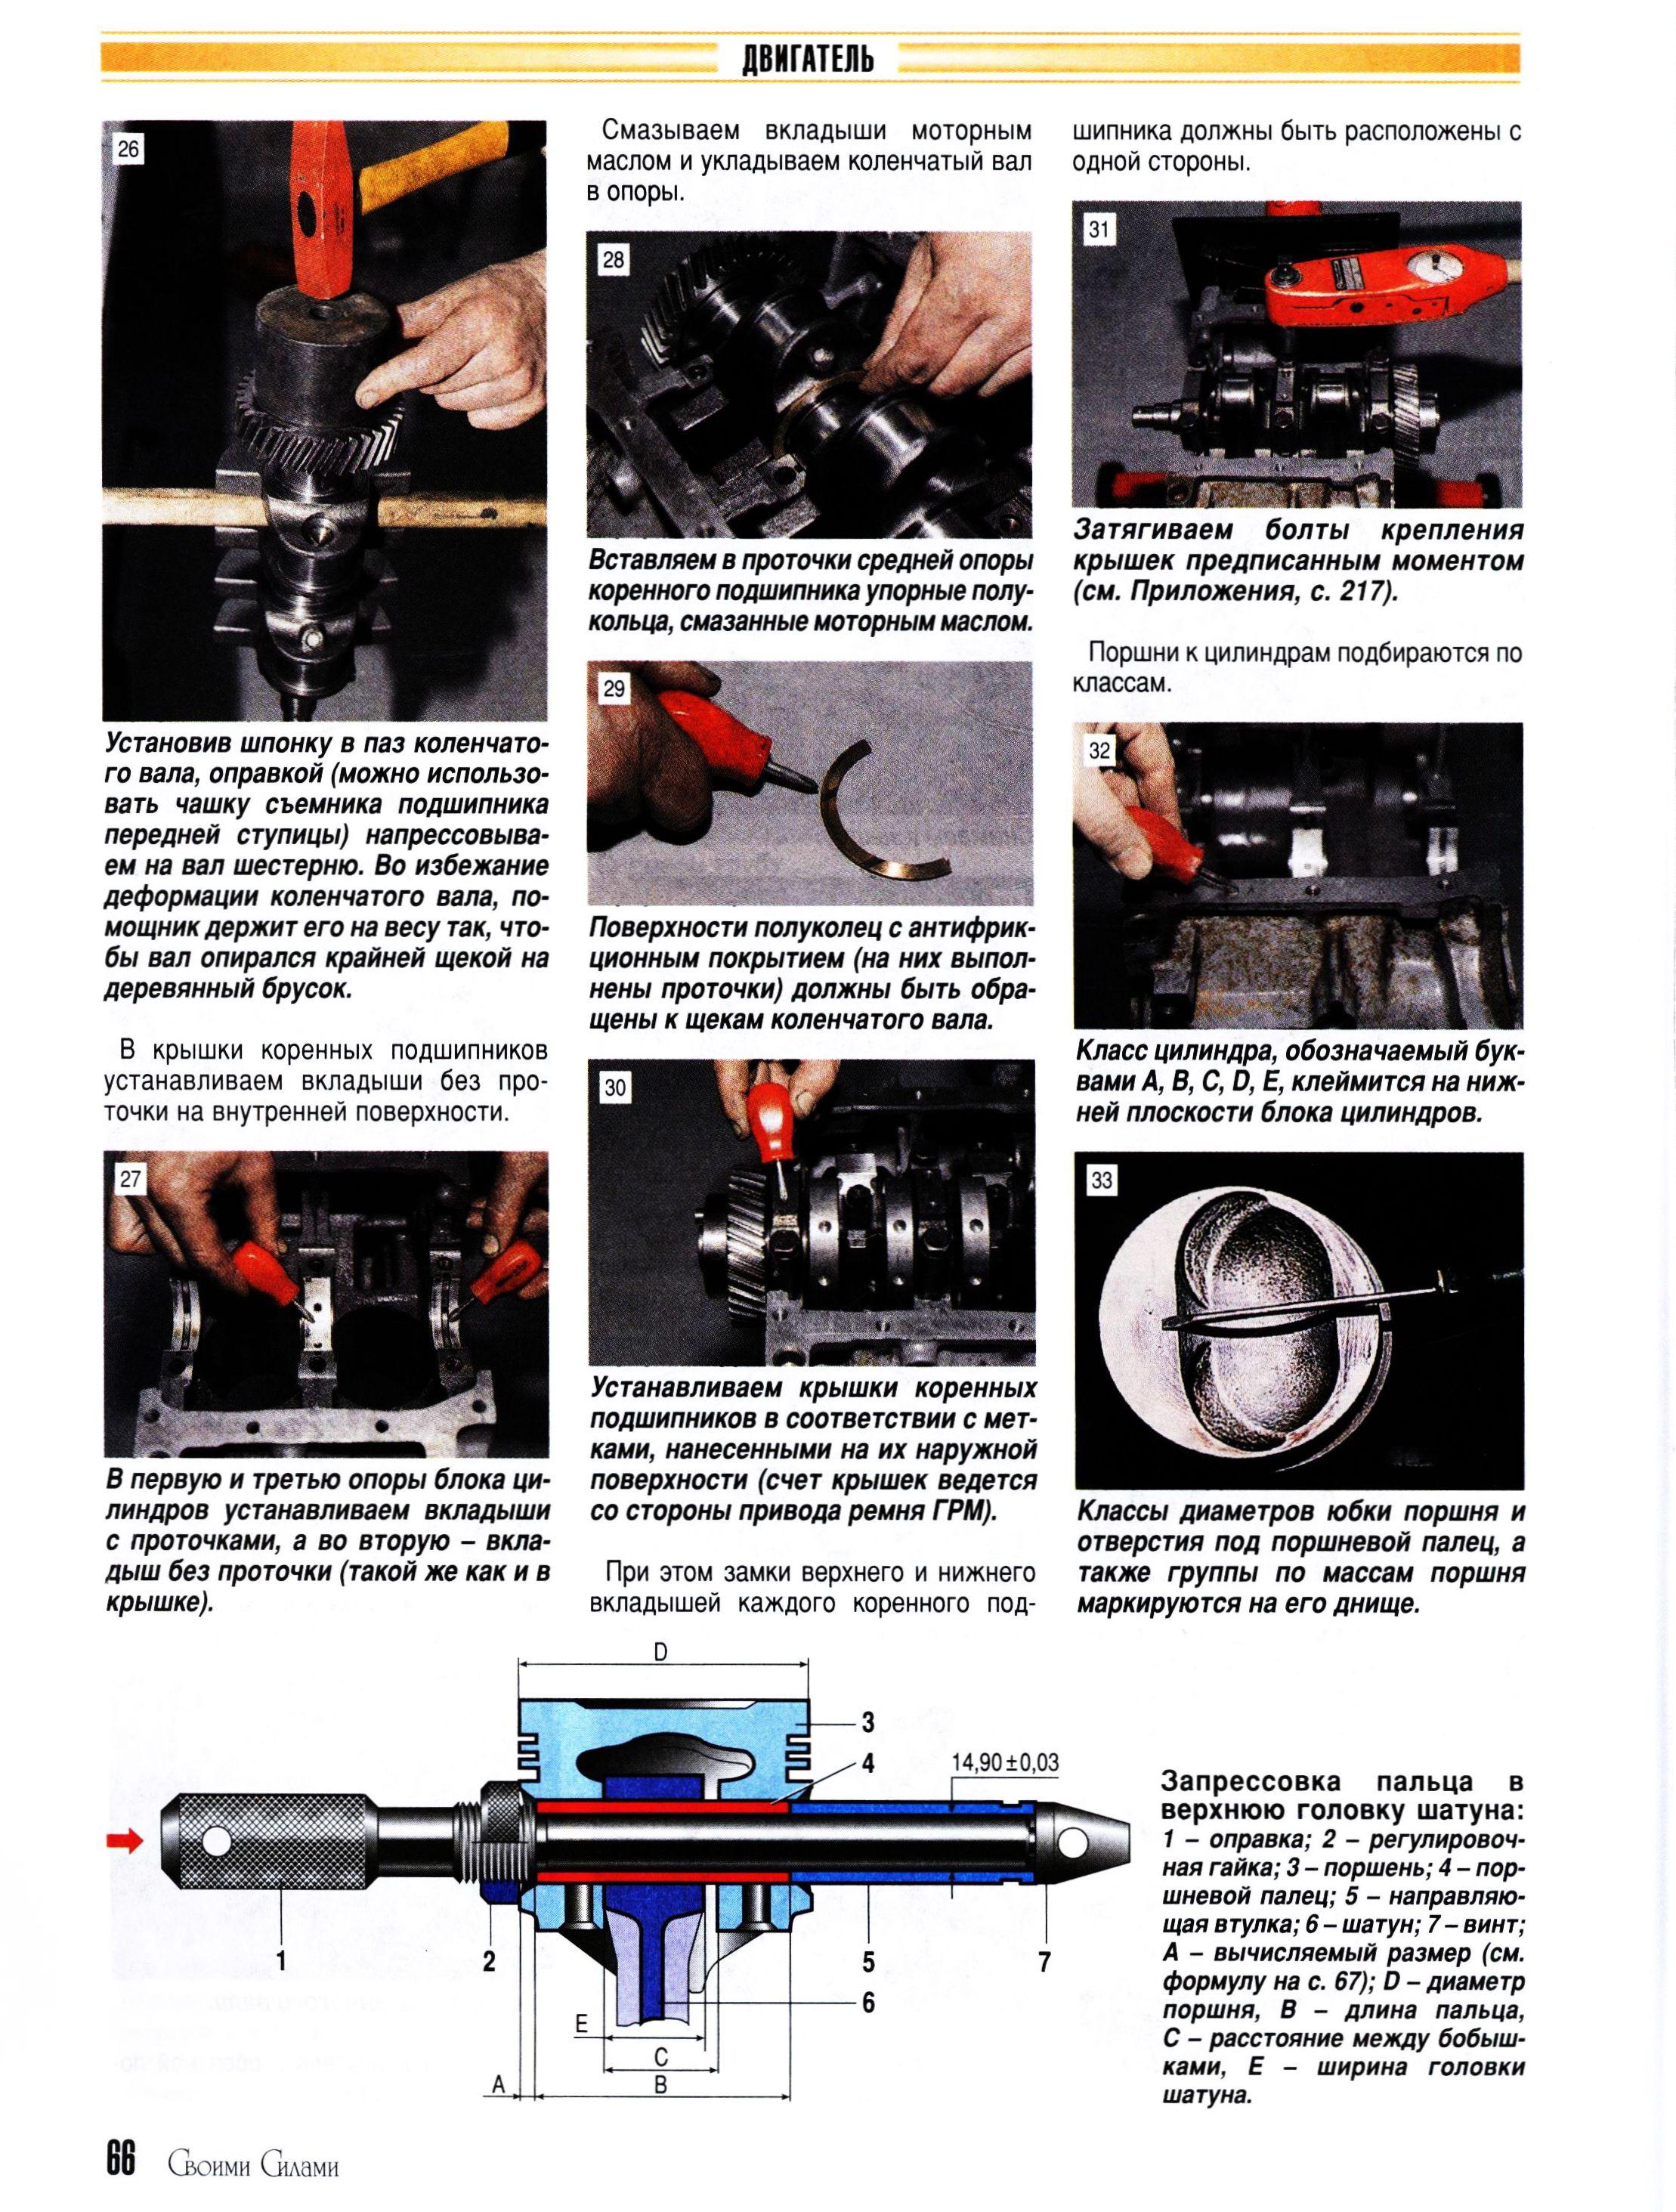 Двигатель ока: описание, характеристики и тюнинг